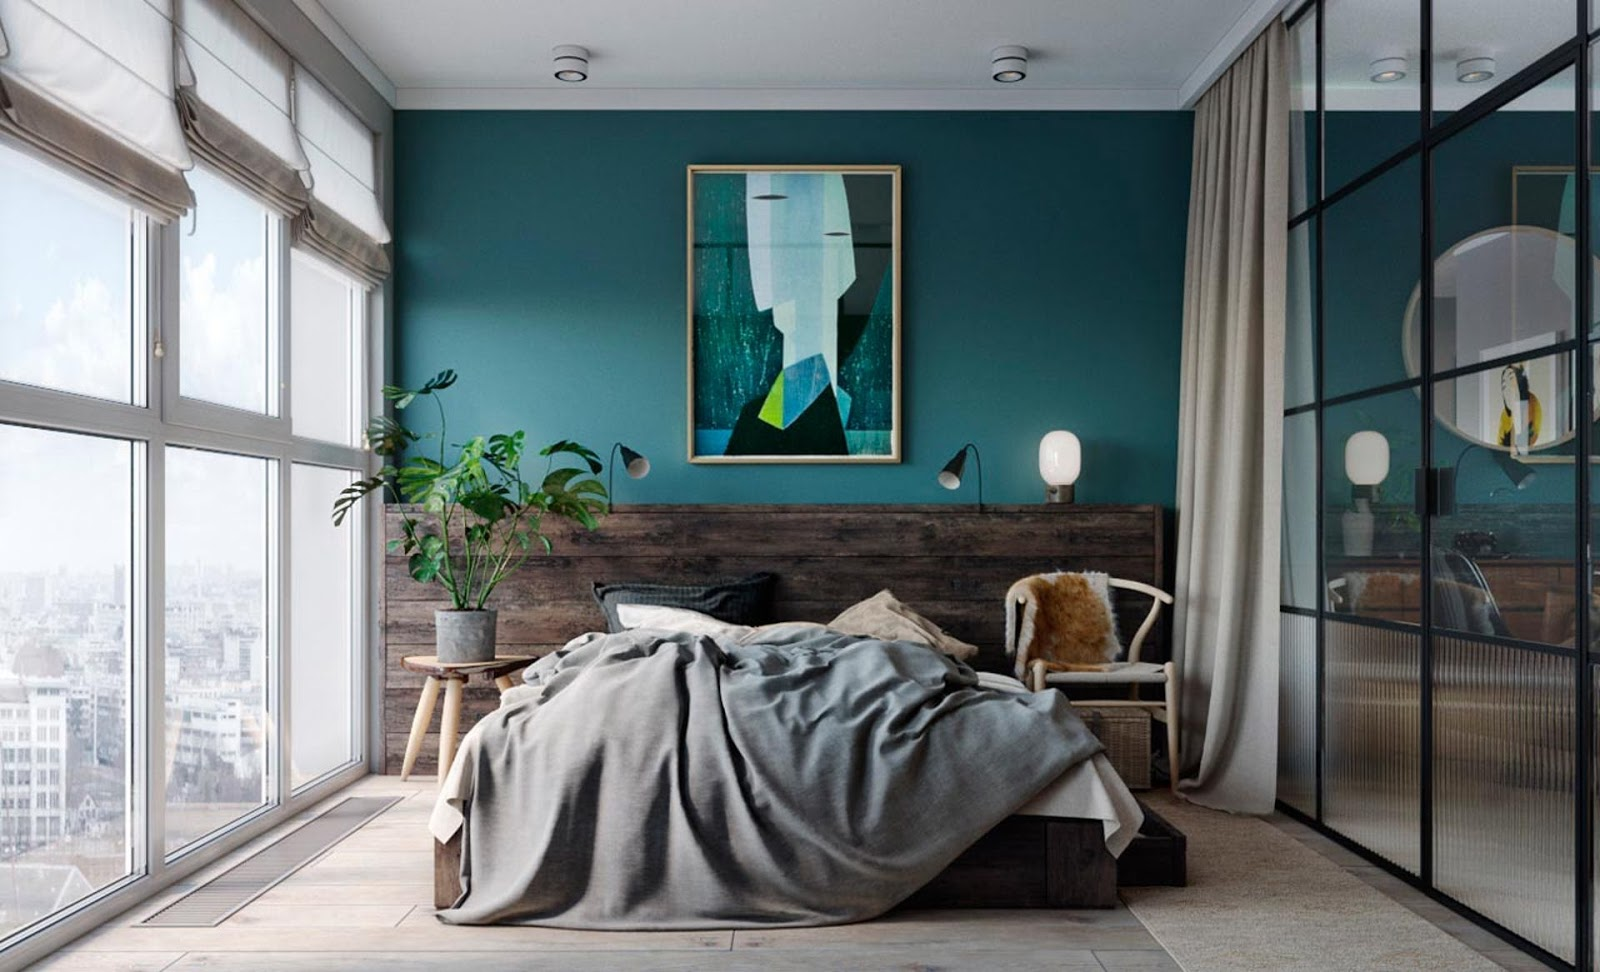 Bedroom Glass Chair Leap V2 Design Attractor Super Fresh Tiny Loft Apartment In Kiev